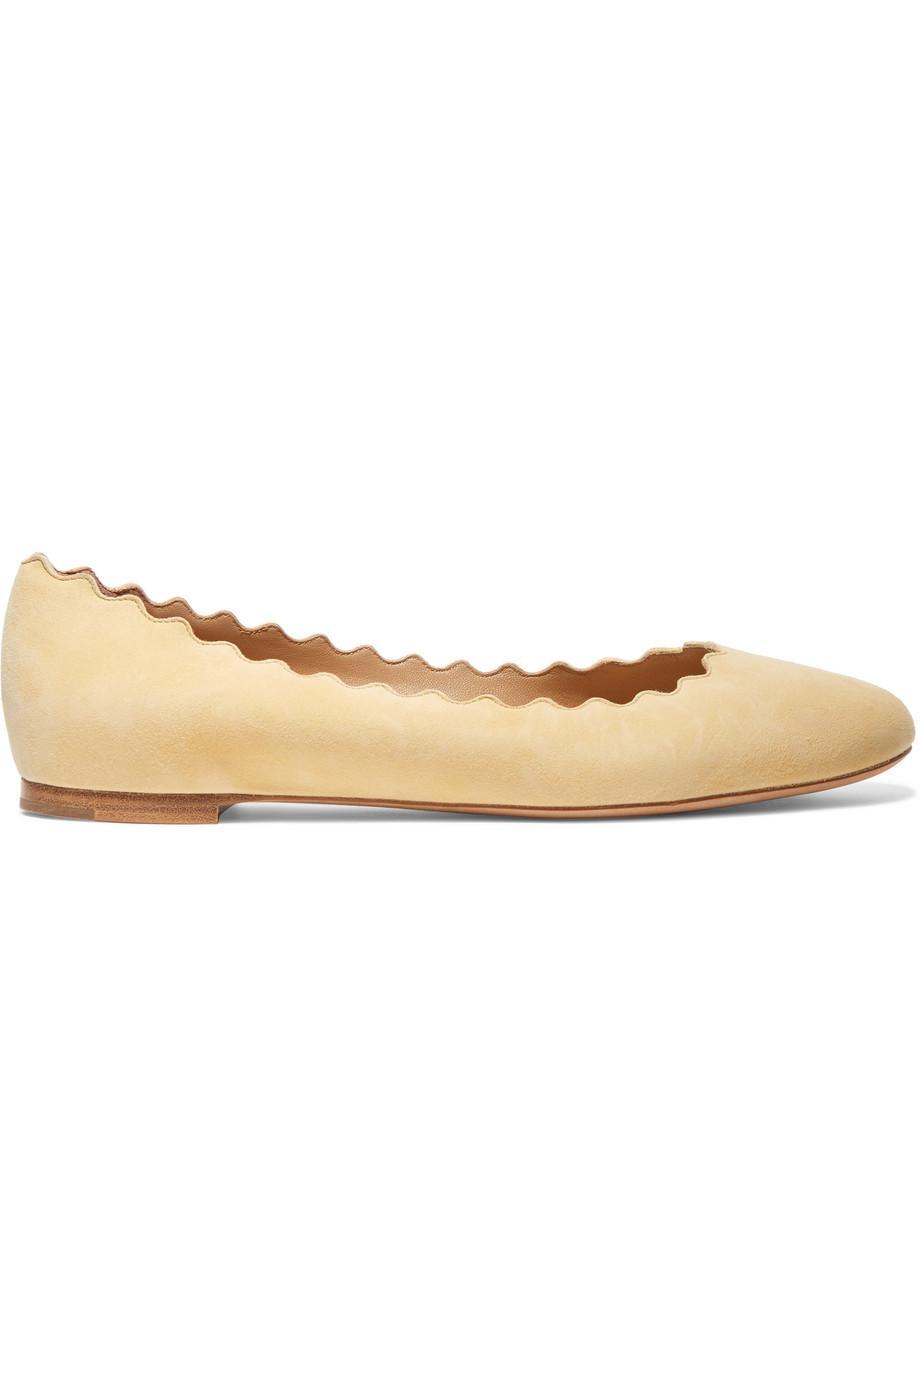 5cce84af Women's Natural Lauren Scalloped Suede Ballerina Flat